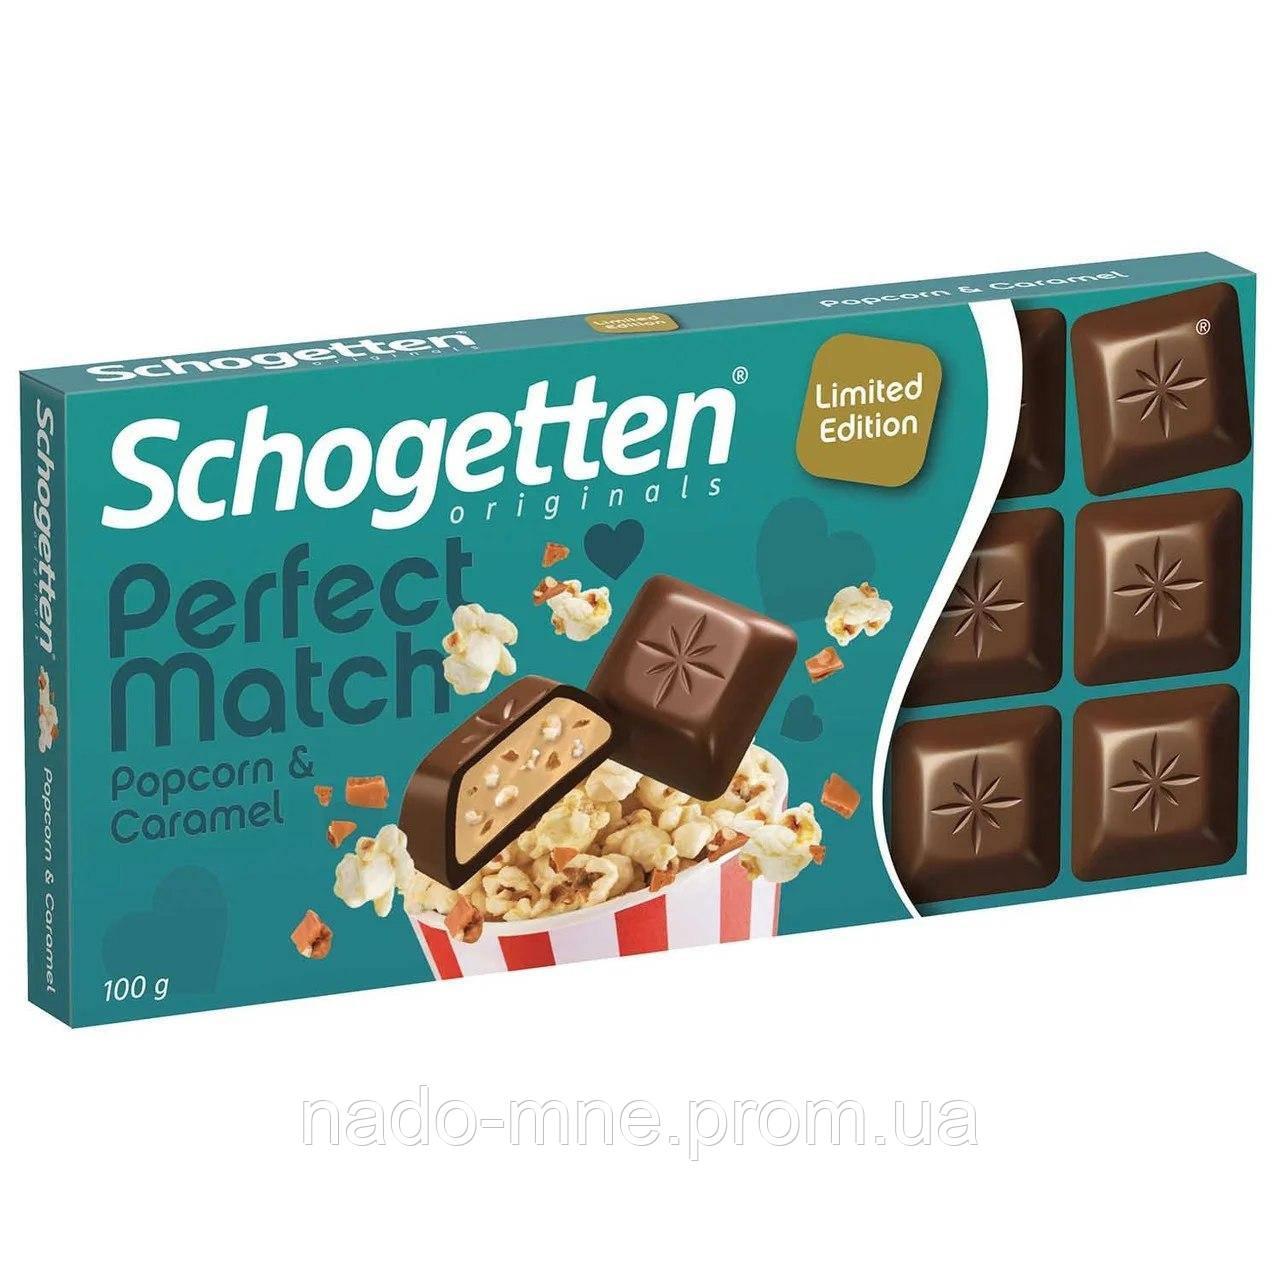 Шоколад молочный Limited Edition Schogetten Perfect Match Popcorn & Caramel 100г